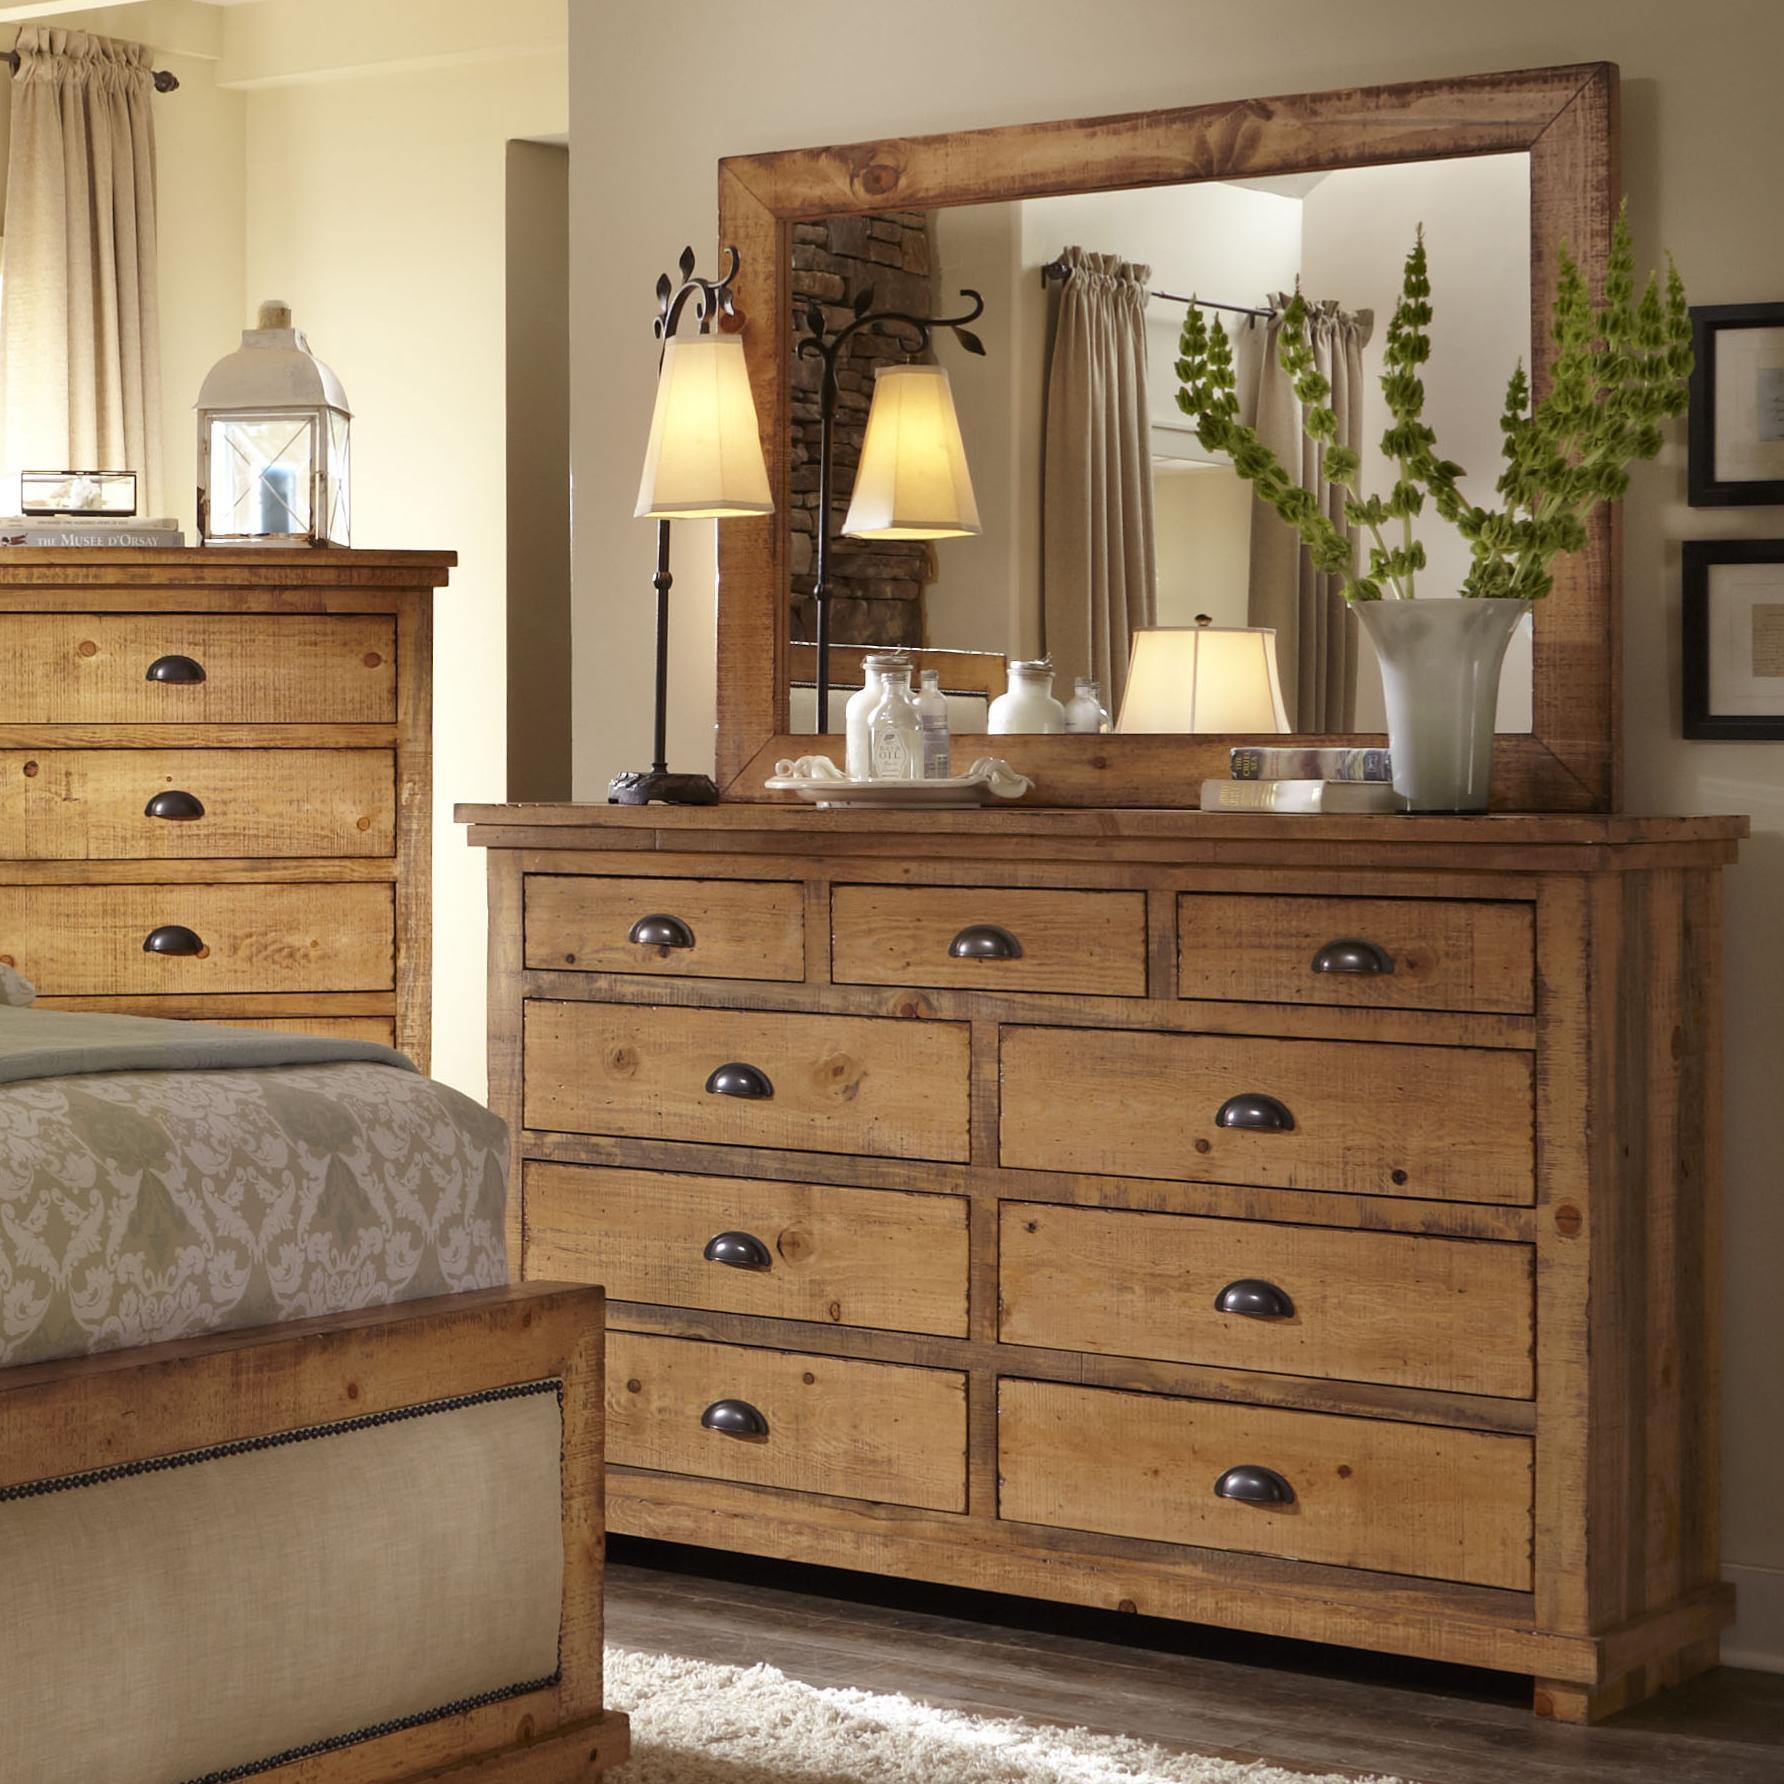 Progressive Furniture Willow Distressed Pine Drawer Dresser Mirror Zak 39 S Fine Furniture